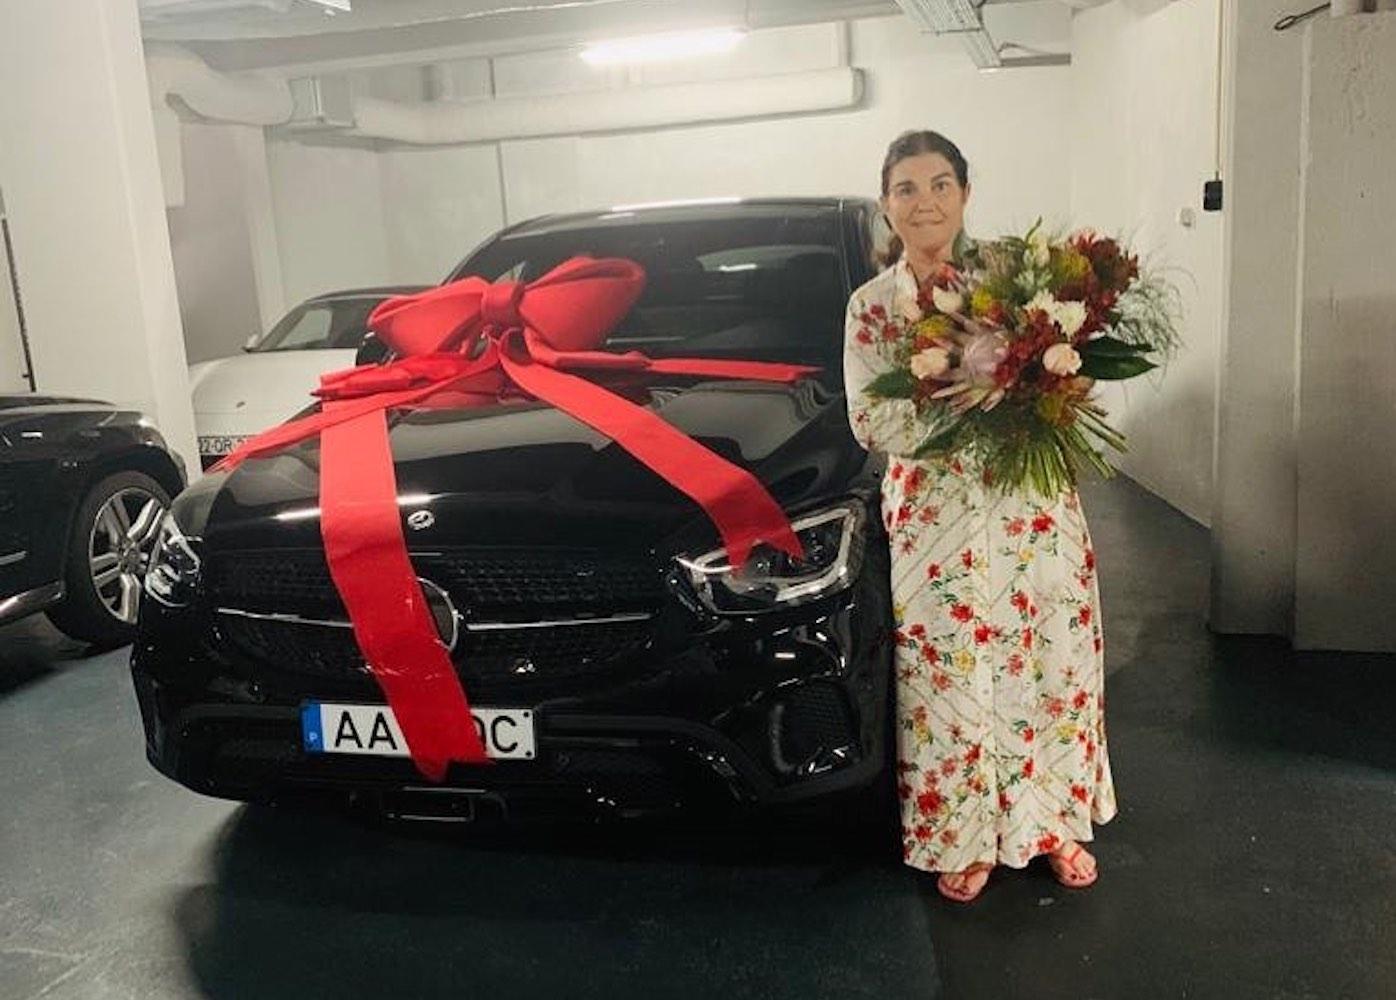 Dolores Aveiro Carro Dolores Aveiro Recebe Carro De Luxo No Dia Da Mãe